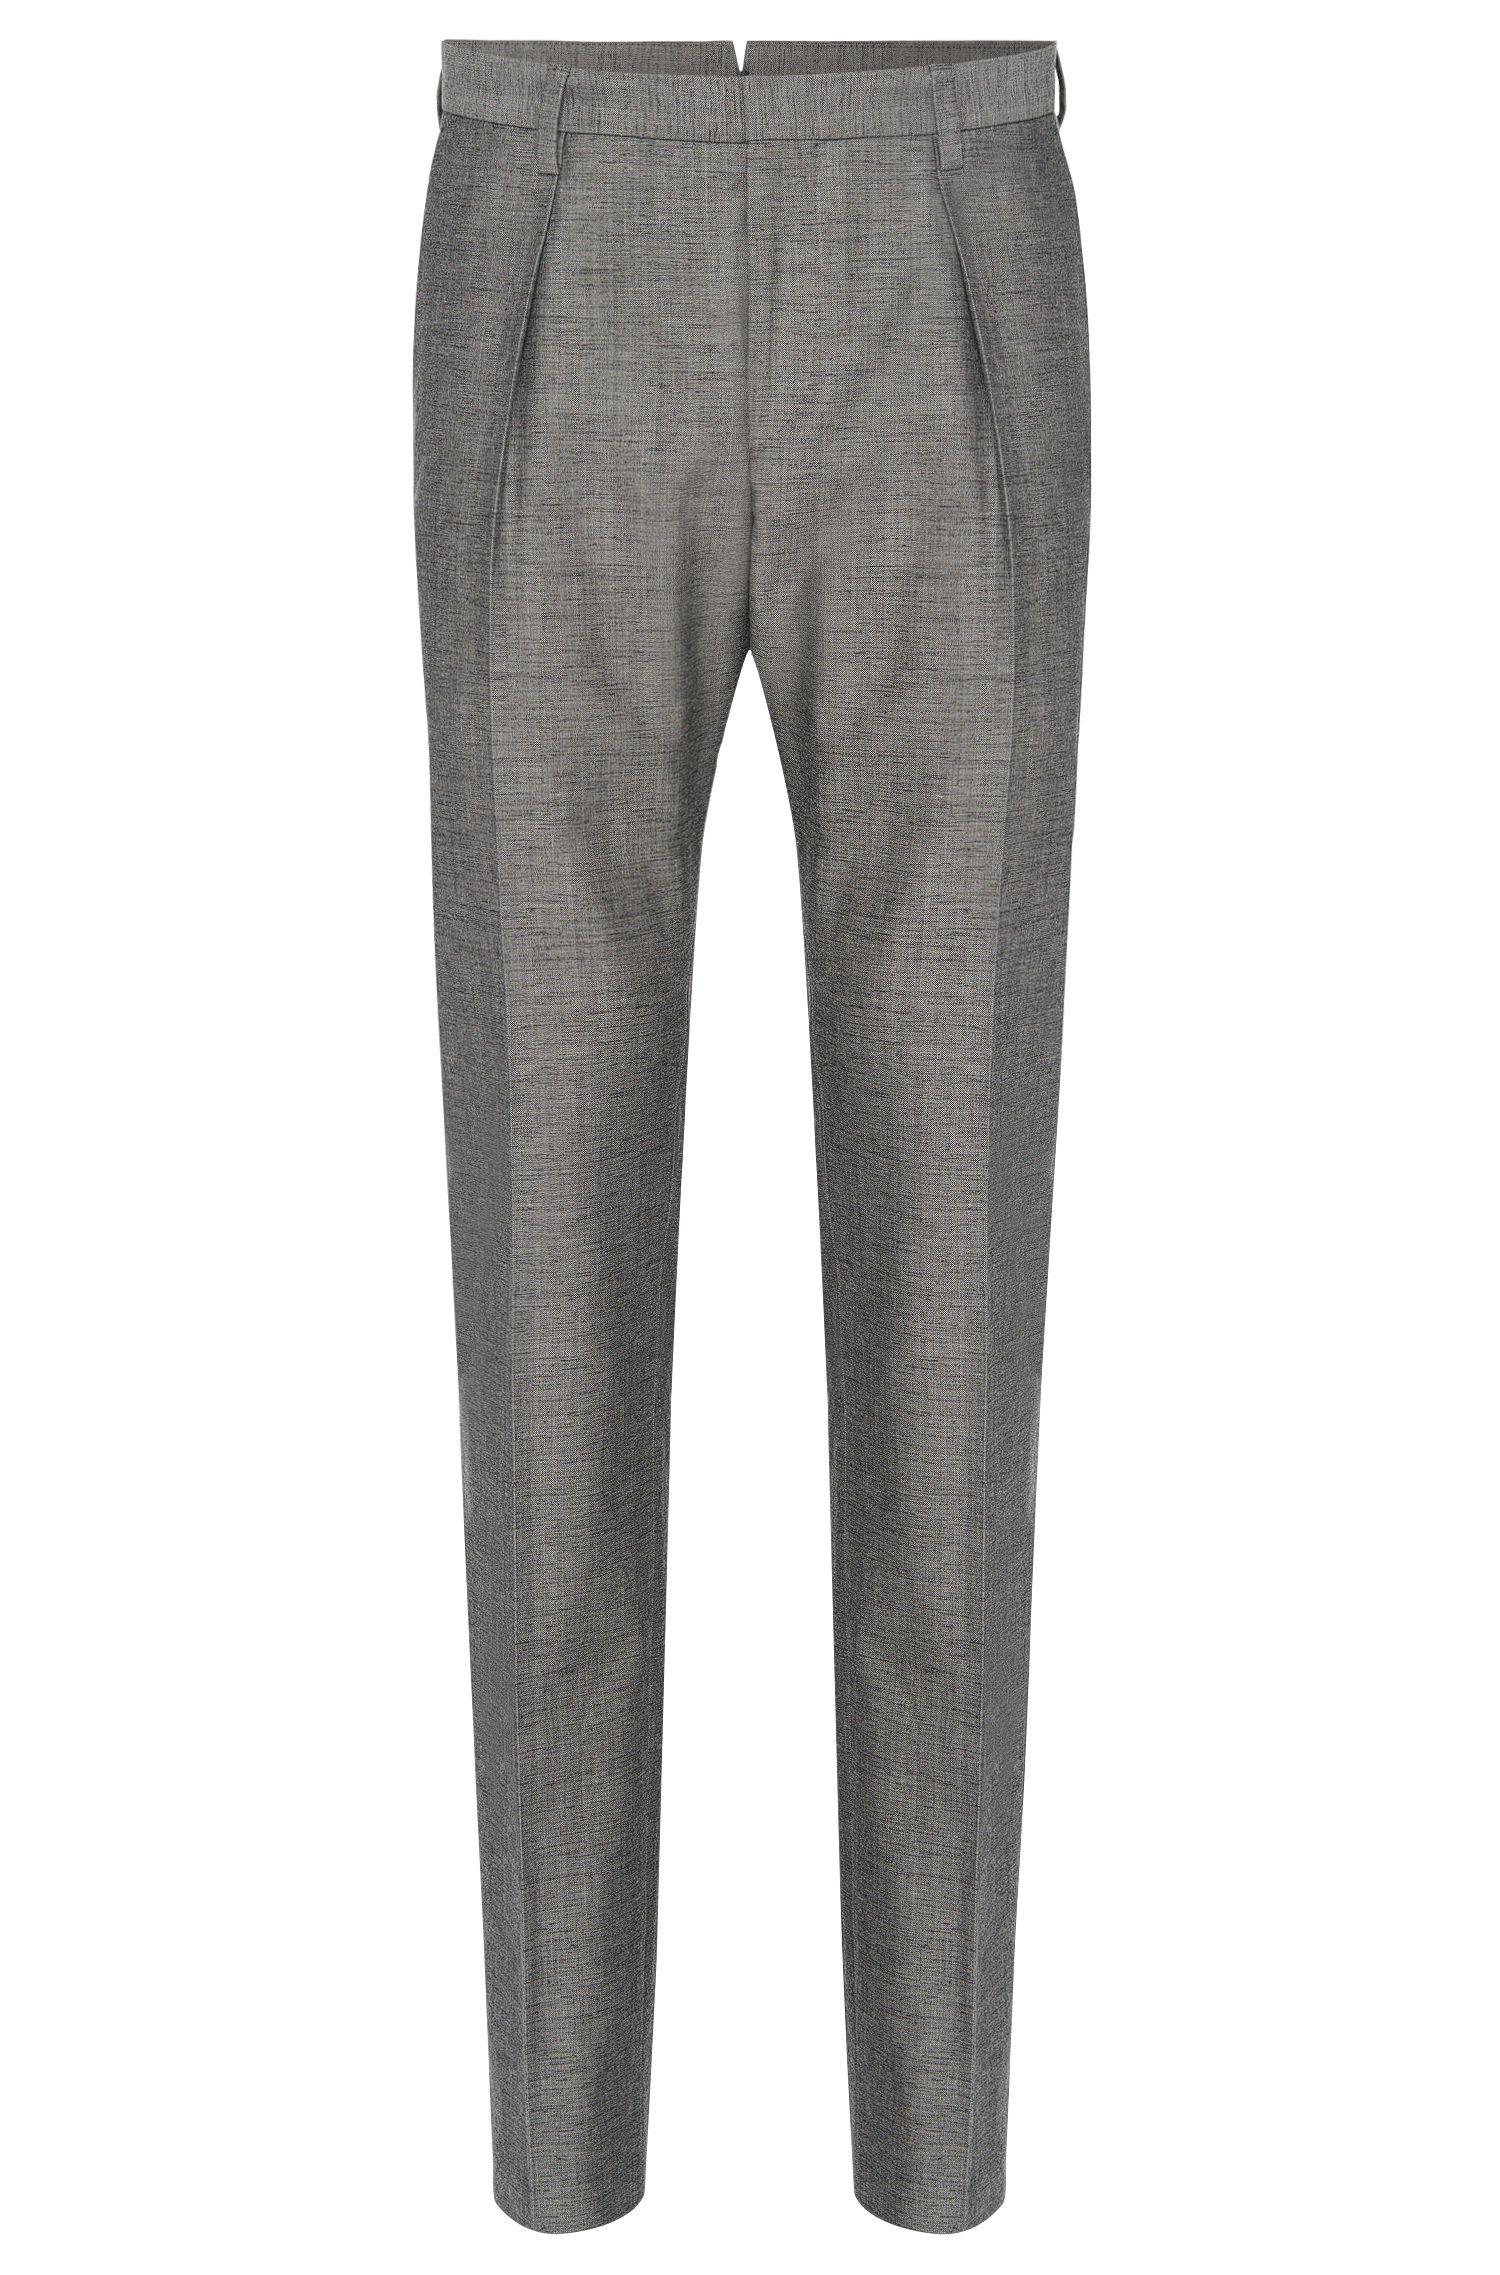 Pantalón jaspeado Tailored slim fit en mezcla de lana virgen con algodón: 'T-Gilman'